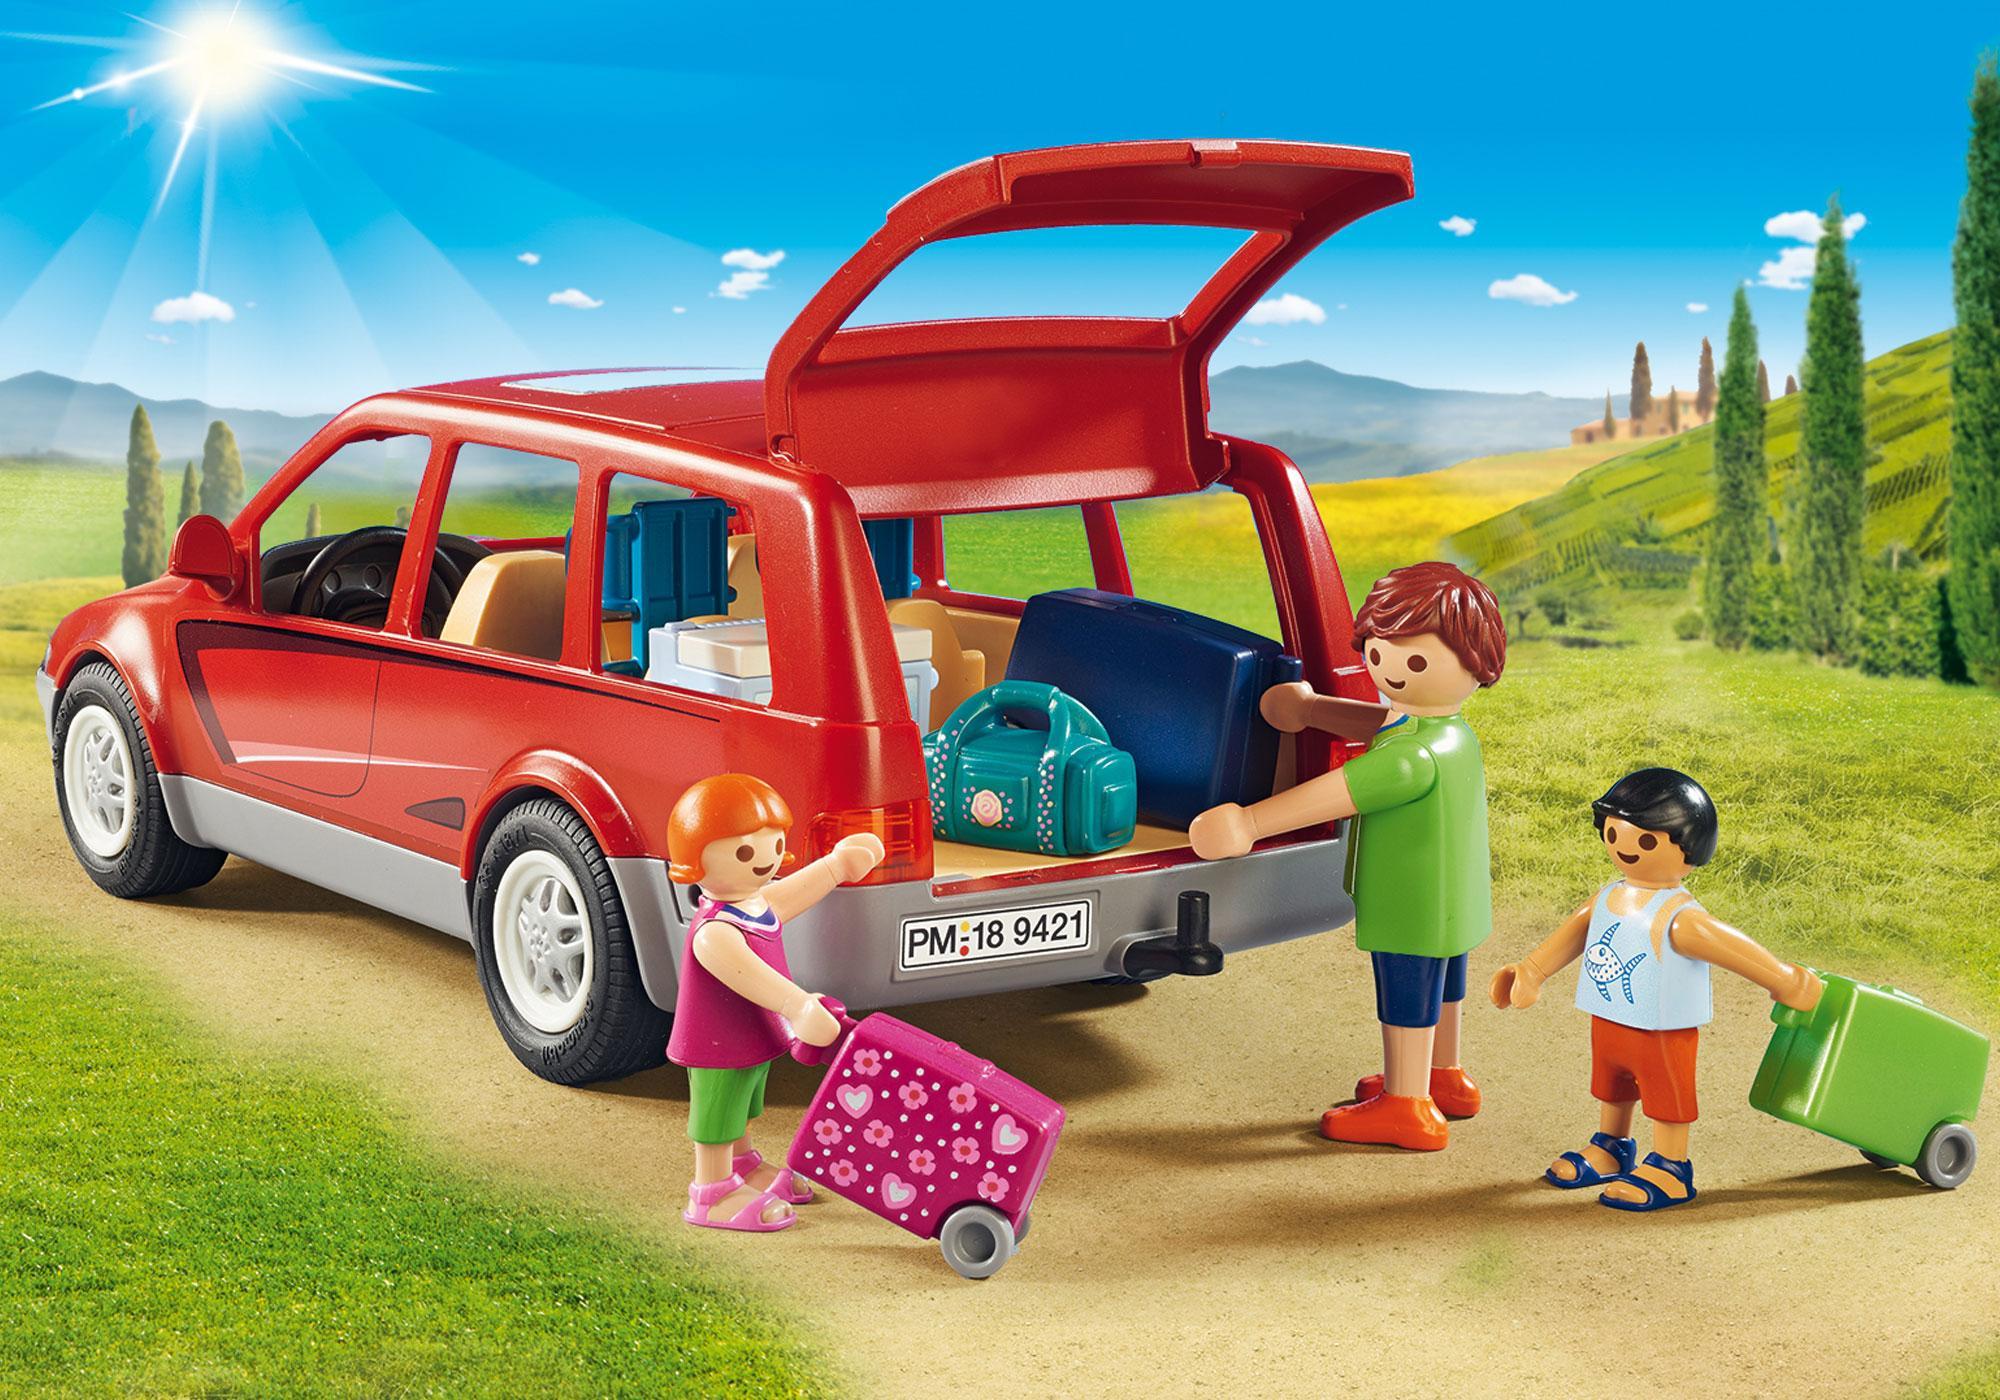 http://media.playmobil.com/i/playmobil/9421_product_extra1/Familjebil